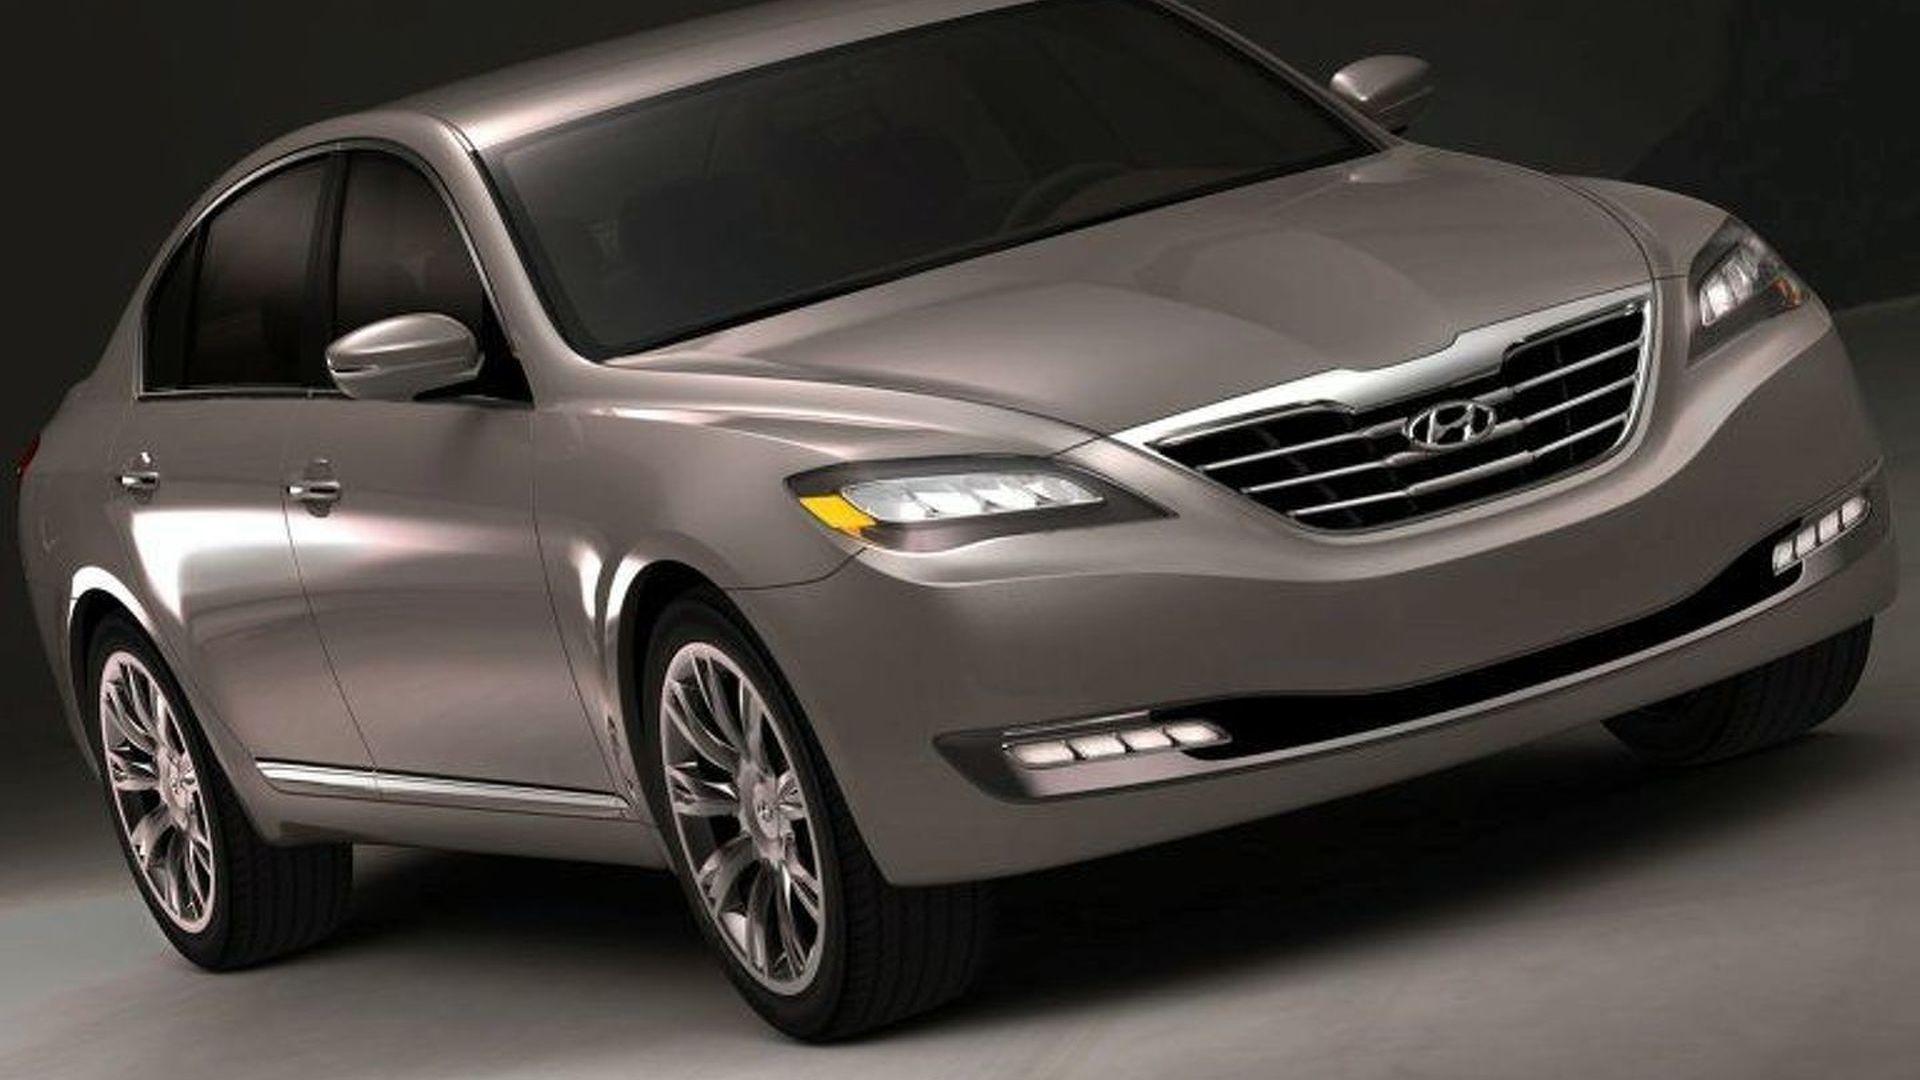 Hyundai Concept Genesis: Details Released